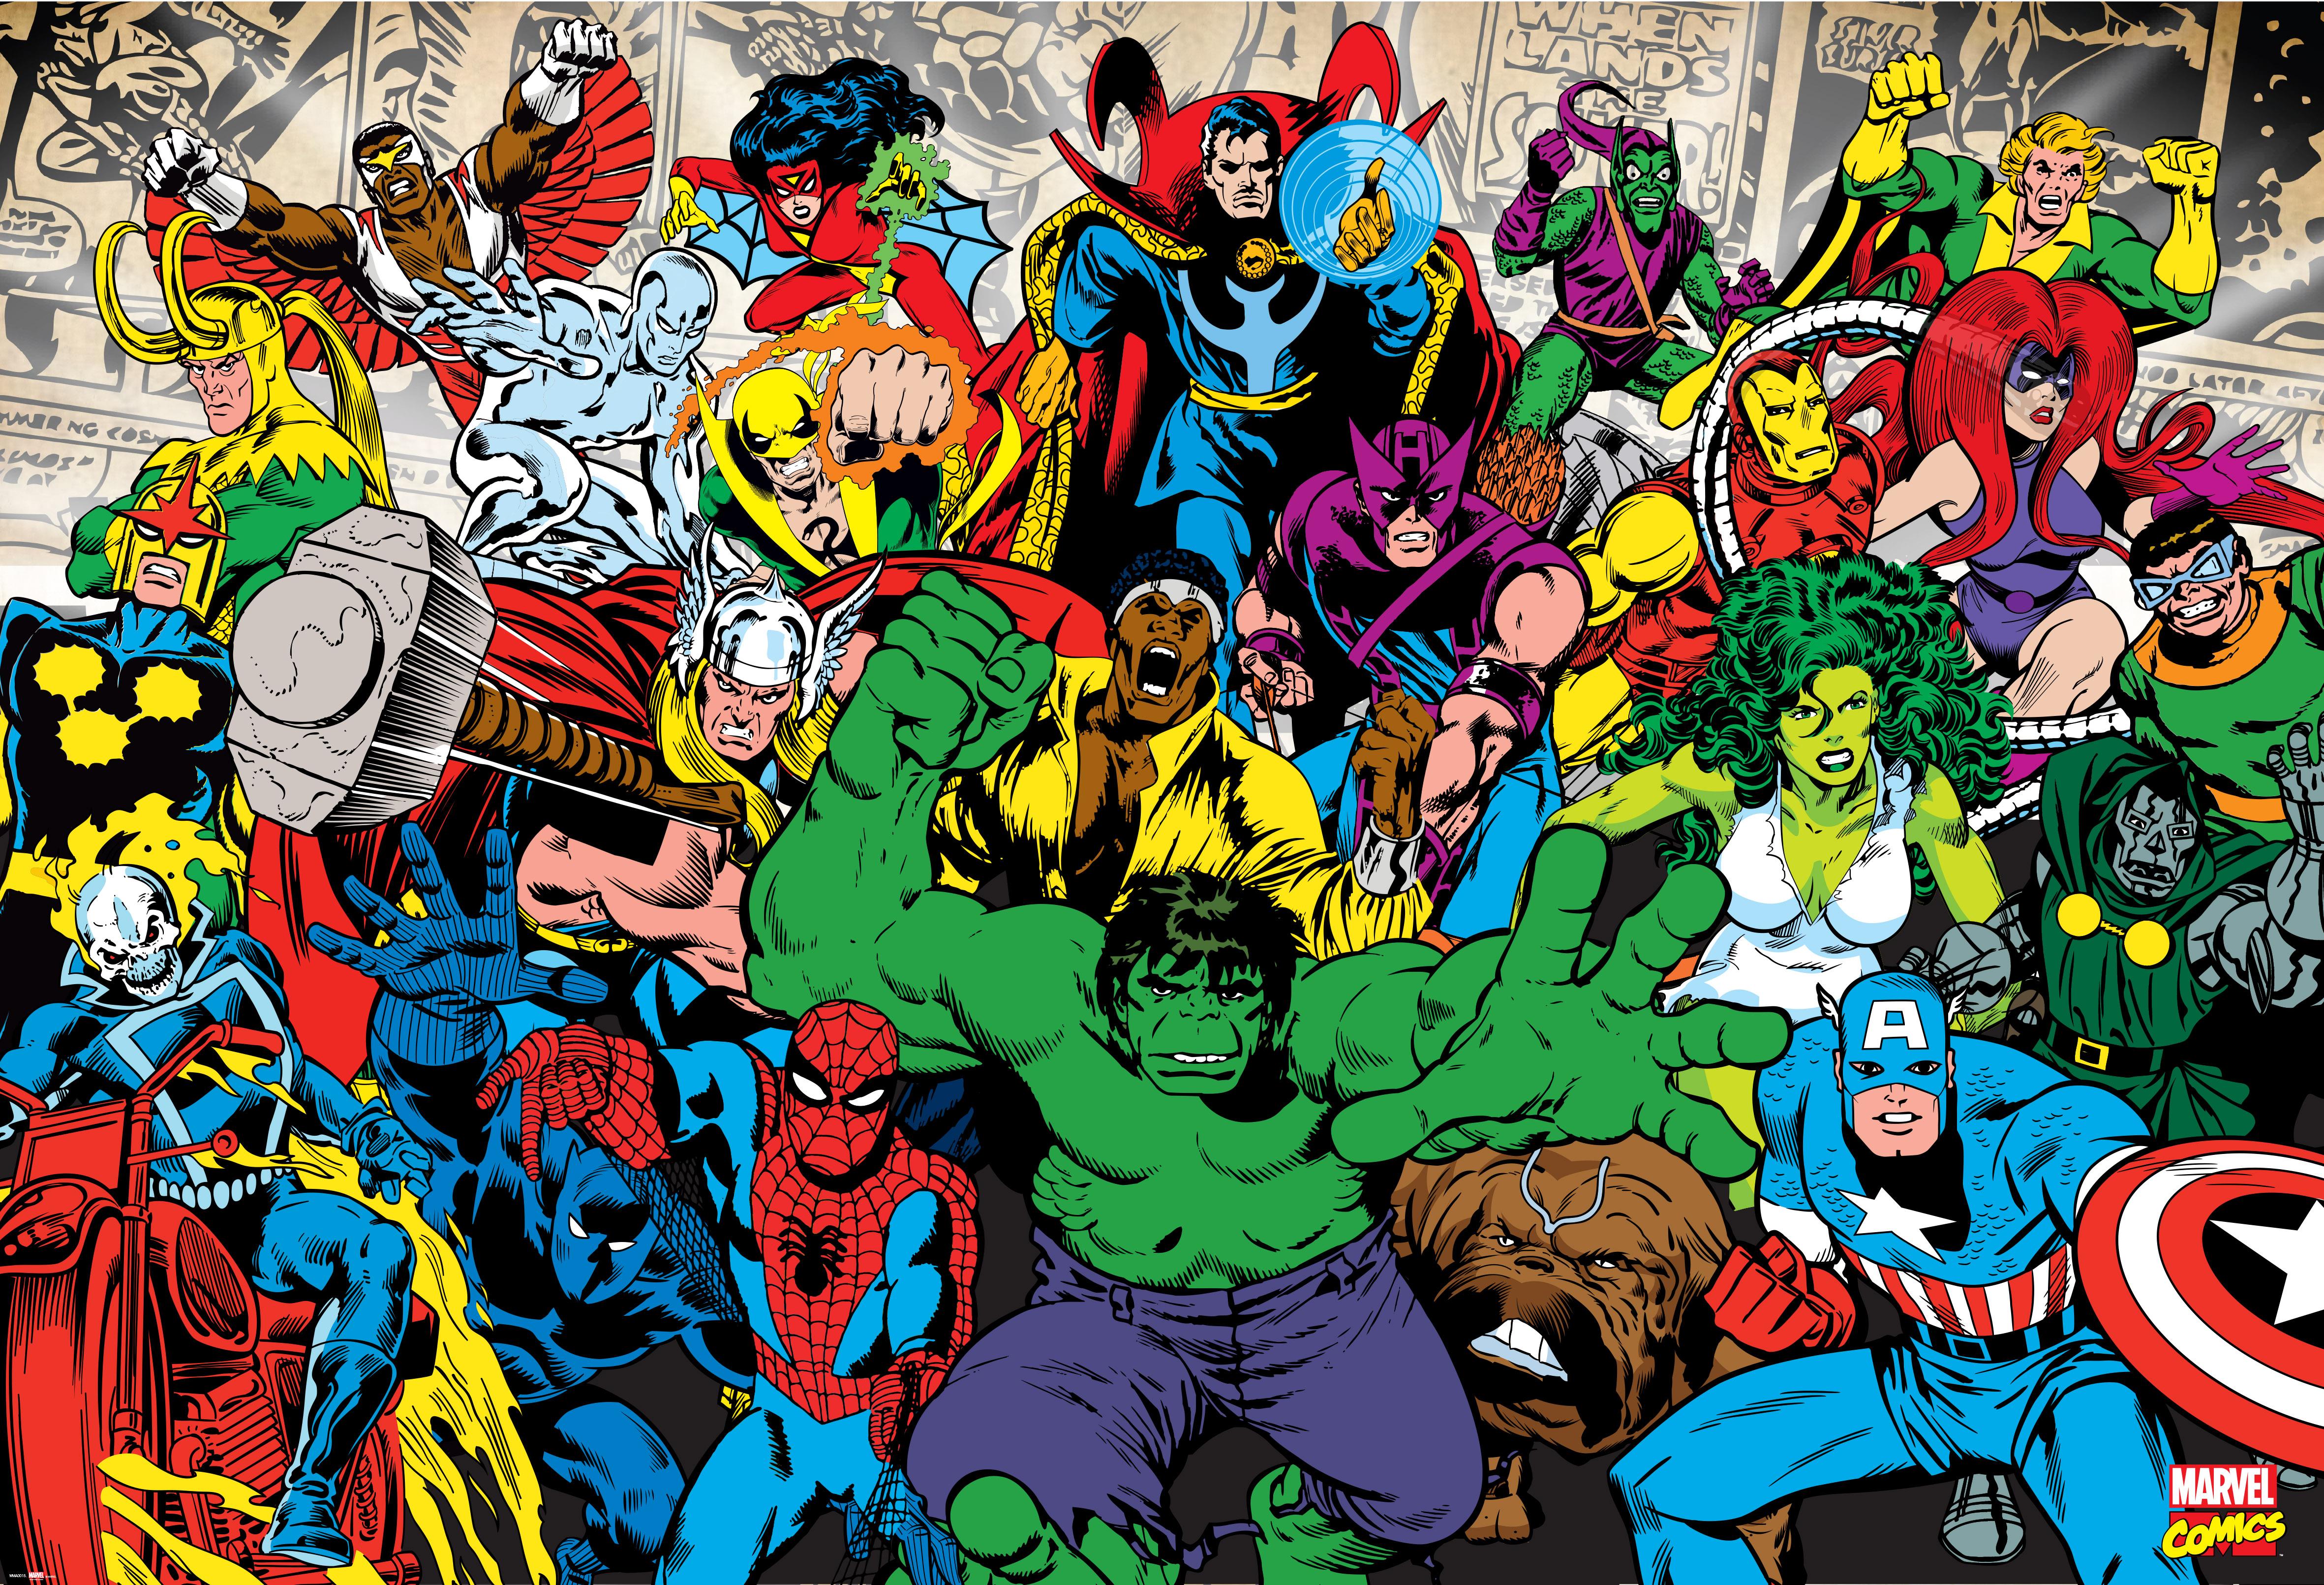 Marvel Villains Wallpaper - WallpaperSafari